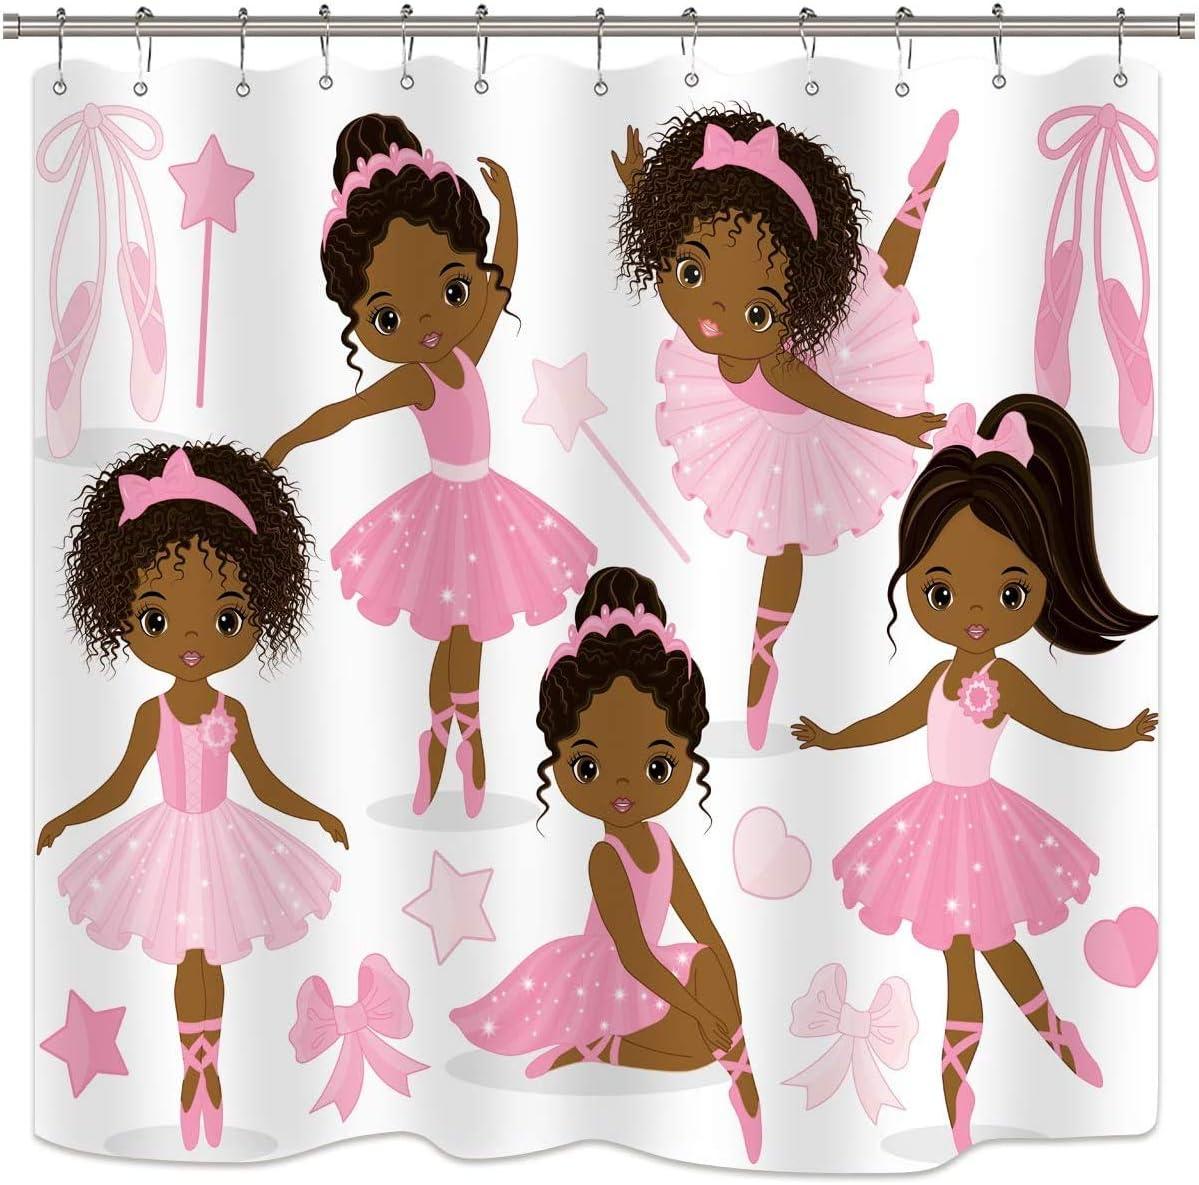 Riyidecor Pink Ballet Shower Curtain Cute Girl Ballerina Dancer Skirt Gymnastic Kid Nursery Bathroom Child Fabric Waterproof For Bathtub 72wx72h Inch Include 12 Pack Plastic Shower Hooks Kitchen Dining